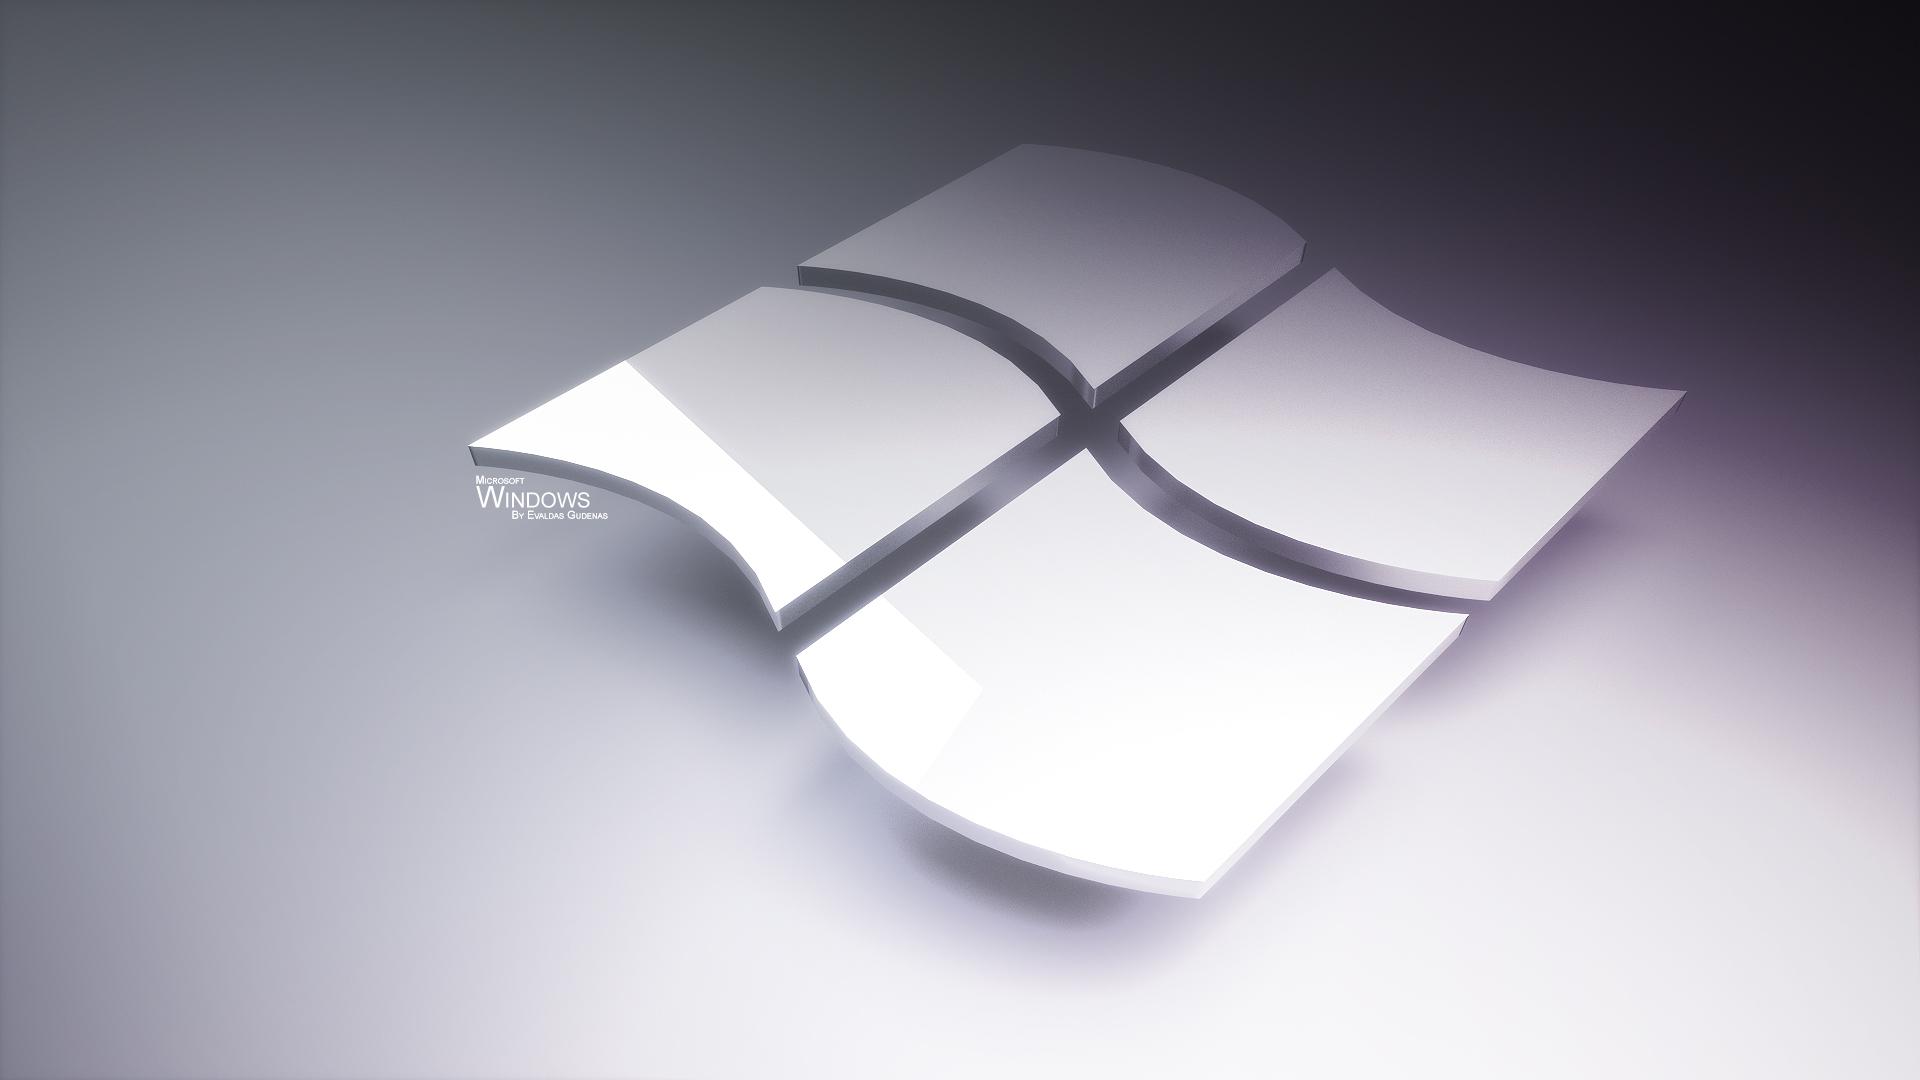 Microsoft Windows Light HD Wallpaper MixHD Wallpapers 1920x1080